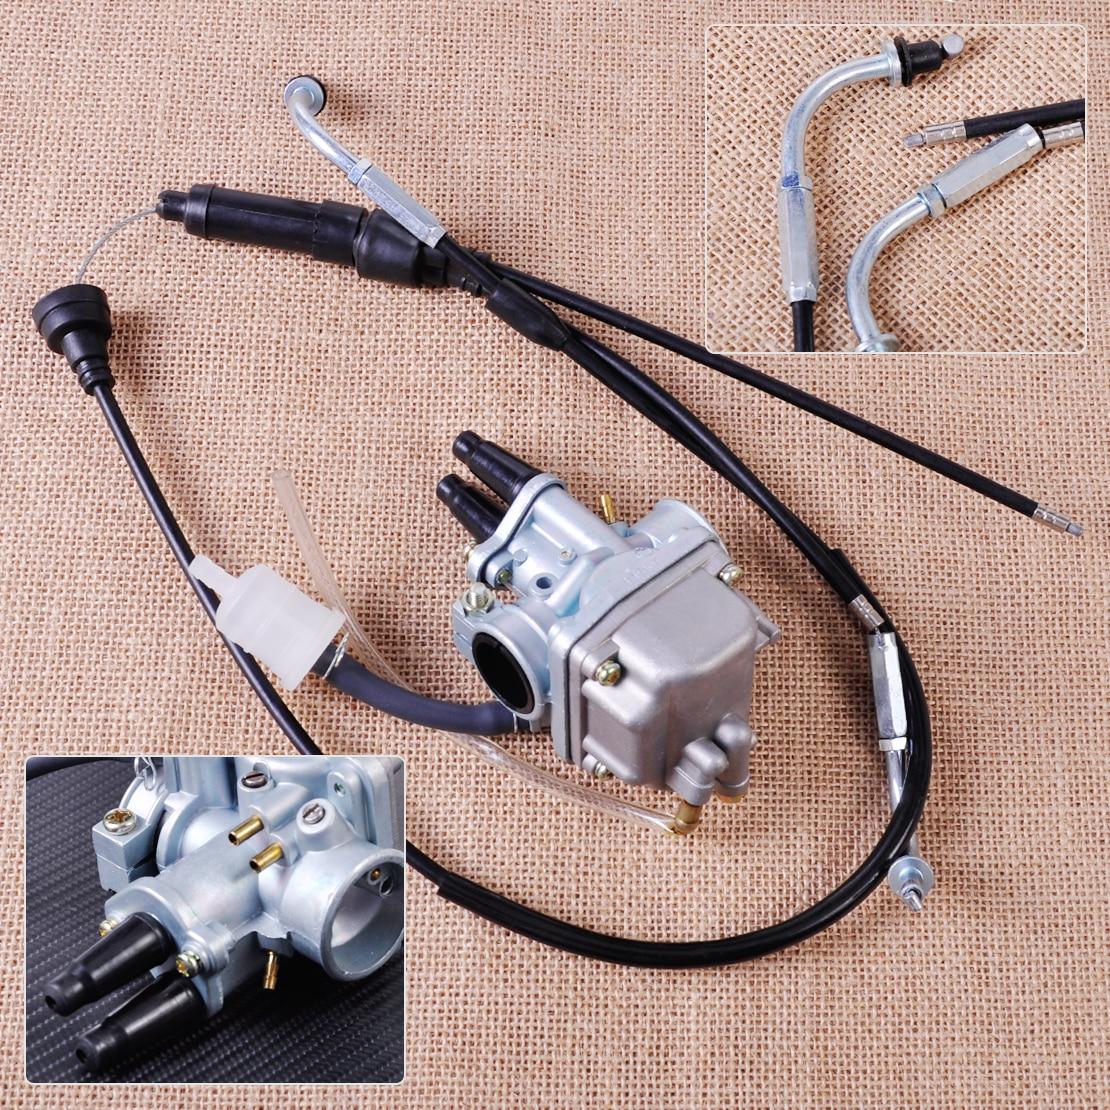 цены  Throttle Cable Carburetor Carb Assembly Assy Kit Fit for Yamaha PW80 Dirt Bike 1985~1998 1999 2000 2001 2002 2003 2004 2005 2006